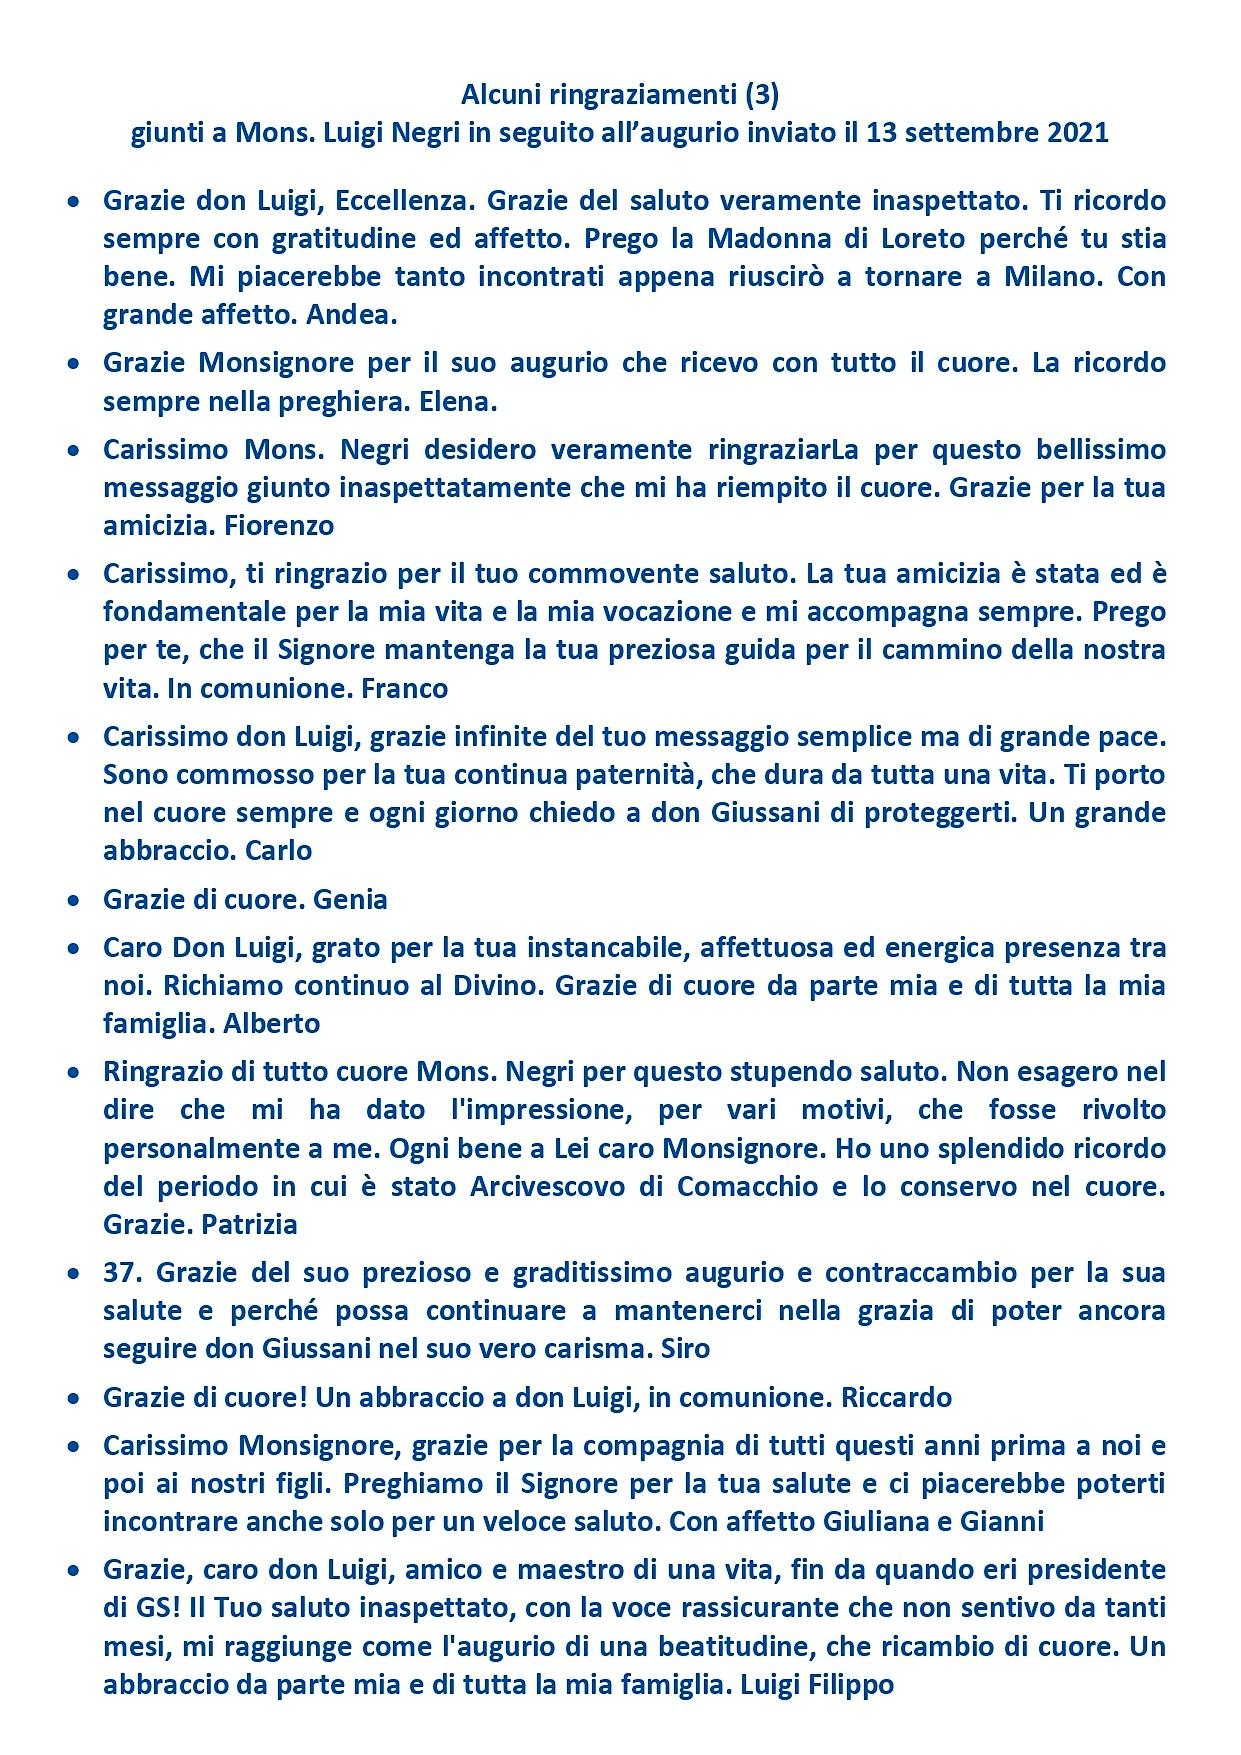 https://www.luiginegri.it/site/wp-content/uploads/2021/09/Caro-Don-Luigi-risposte-3.jpg